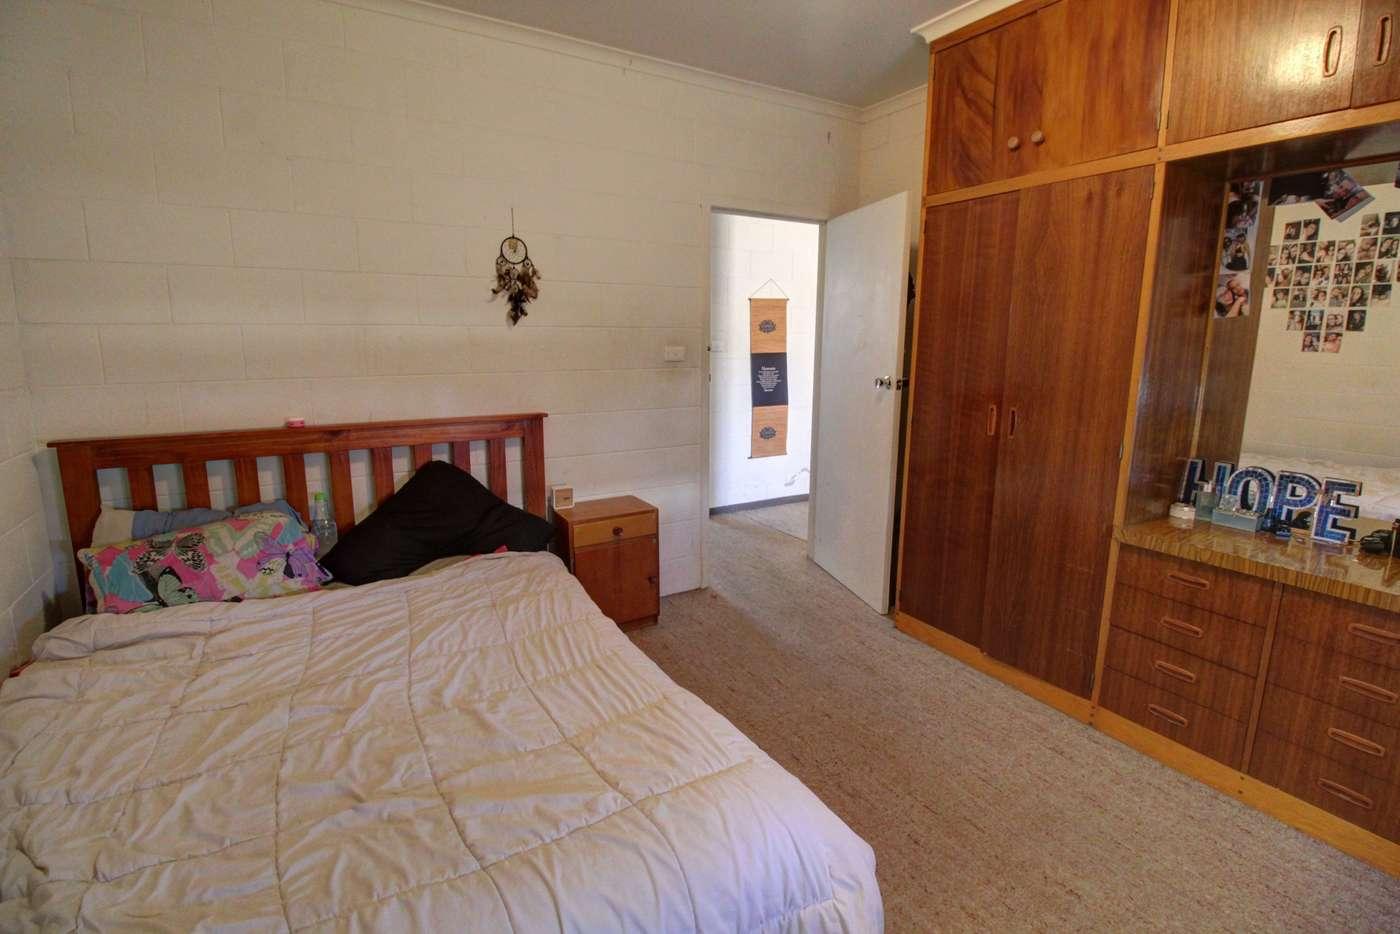 Sixth view of Homely unit listing, Units 1-4, 13 Zante Road, Berri SA 5343